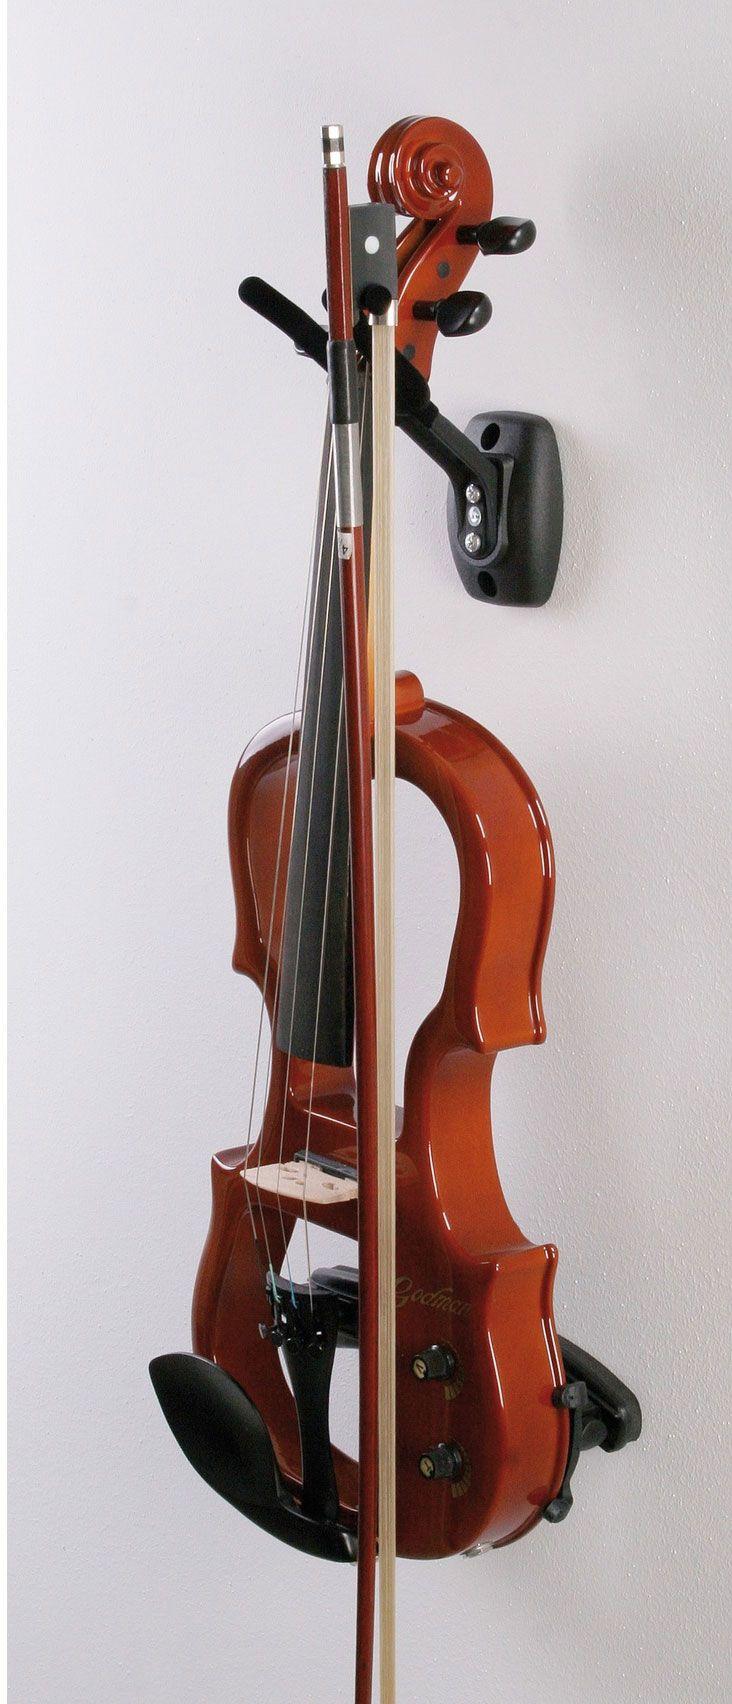 Hidear Wall Mount Violin Hanger Wall Mount Violin Hook Violin holder with Bow Holder 2 Packs